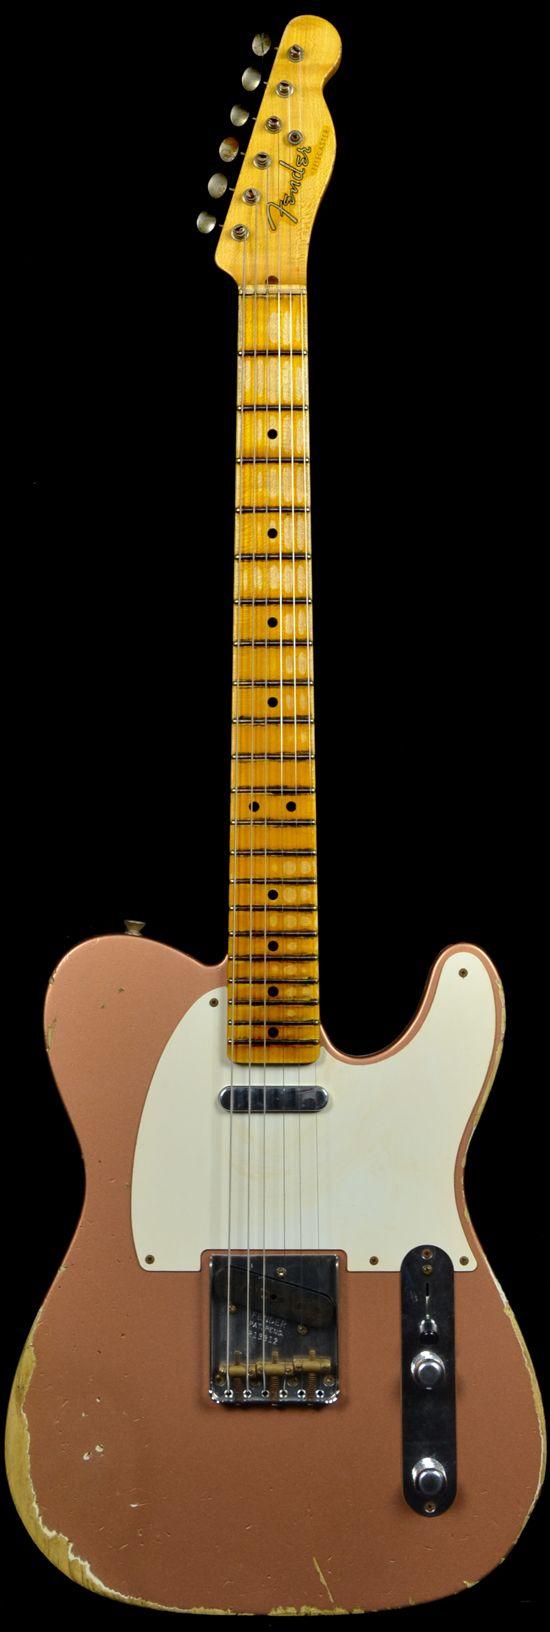 Vintage Fender 1952 Heavy Relic Telecaster Copper